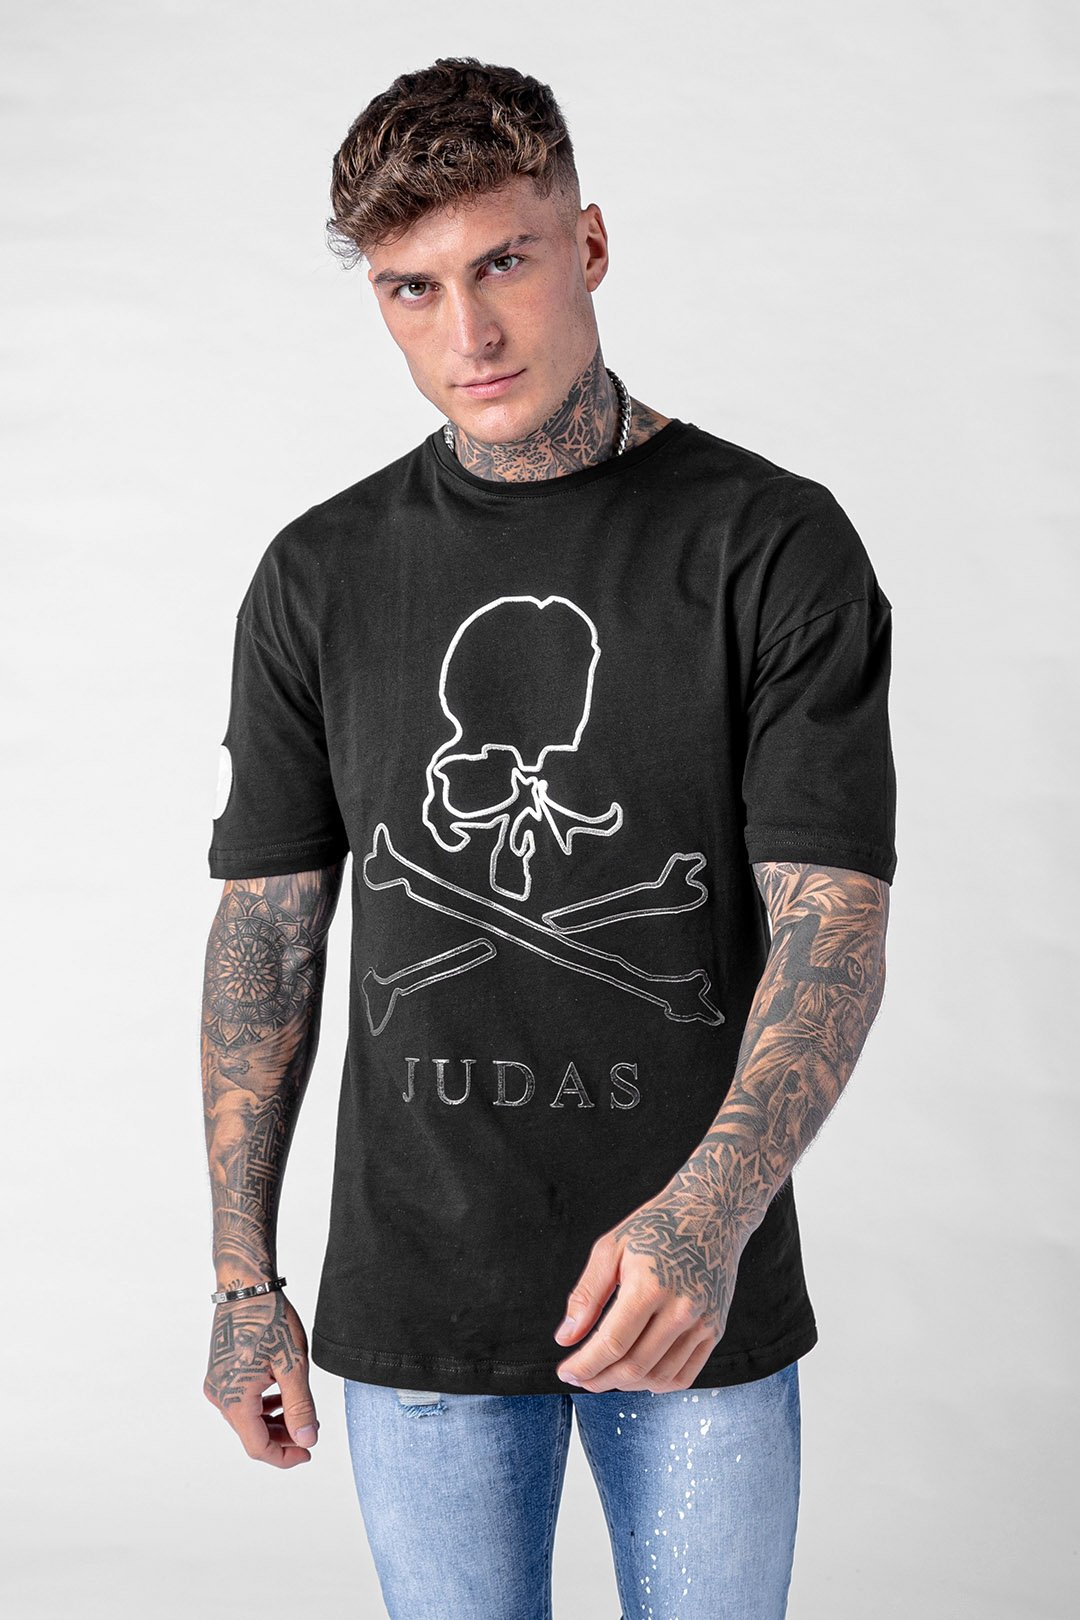 Fader Ombre Foil Skull T-Shirt - Black, Small